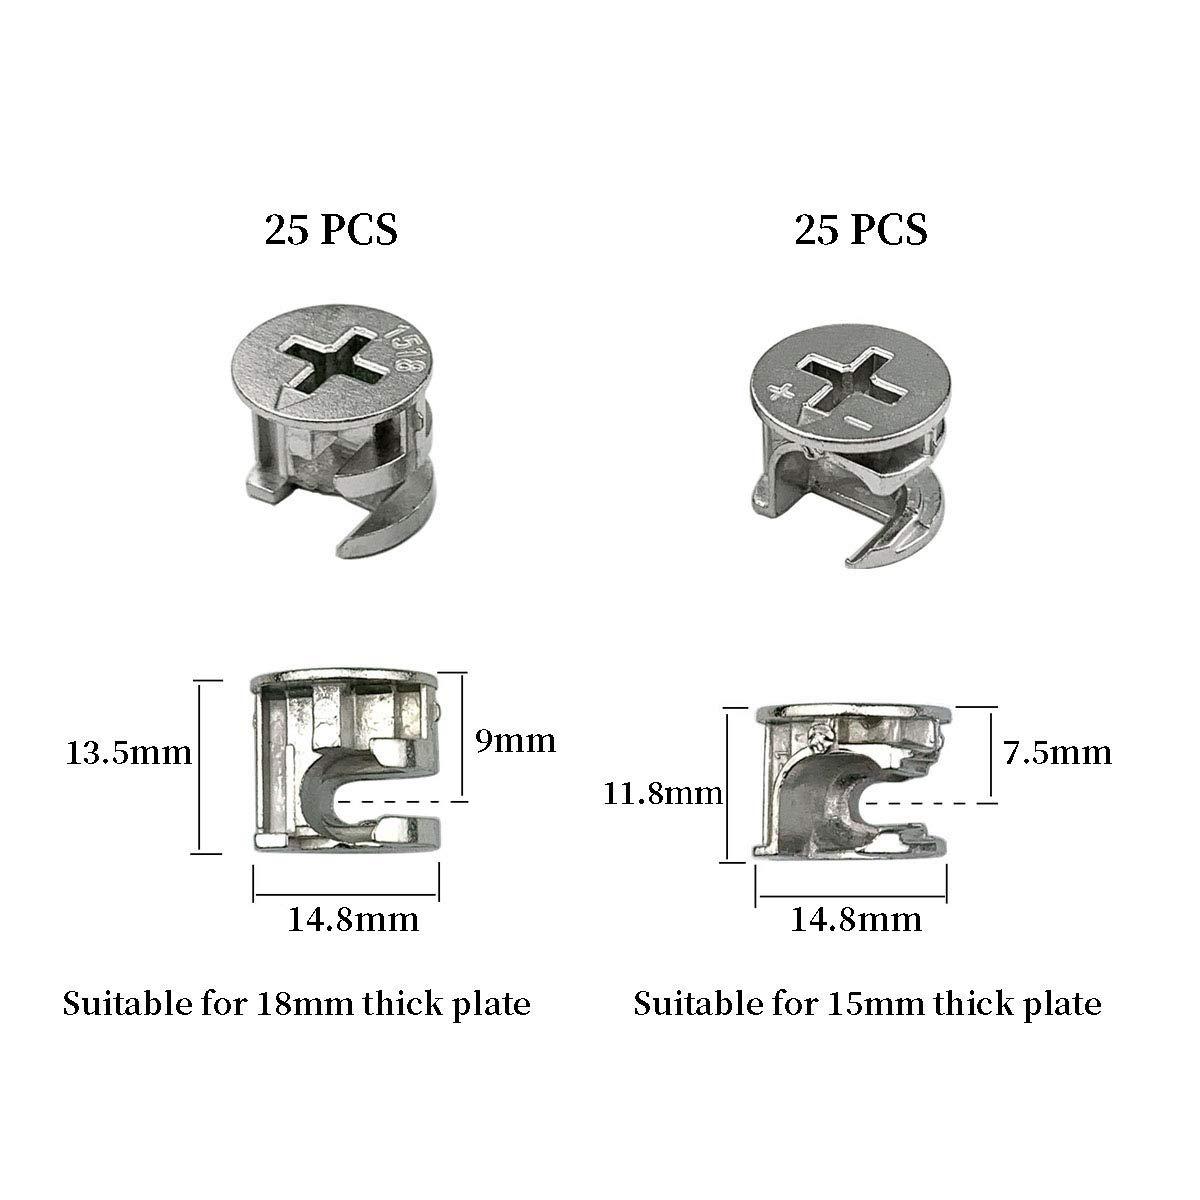 Furniture Connecting Cam Fittings 50Pcs Furniture Connector Fastener Cam Lock Nut